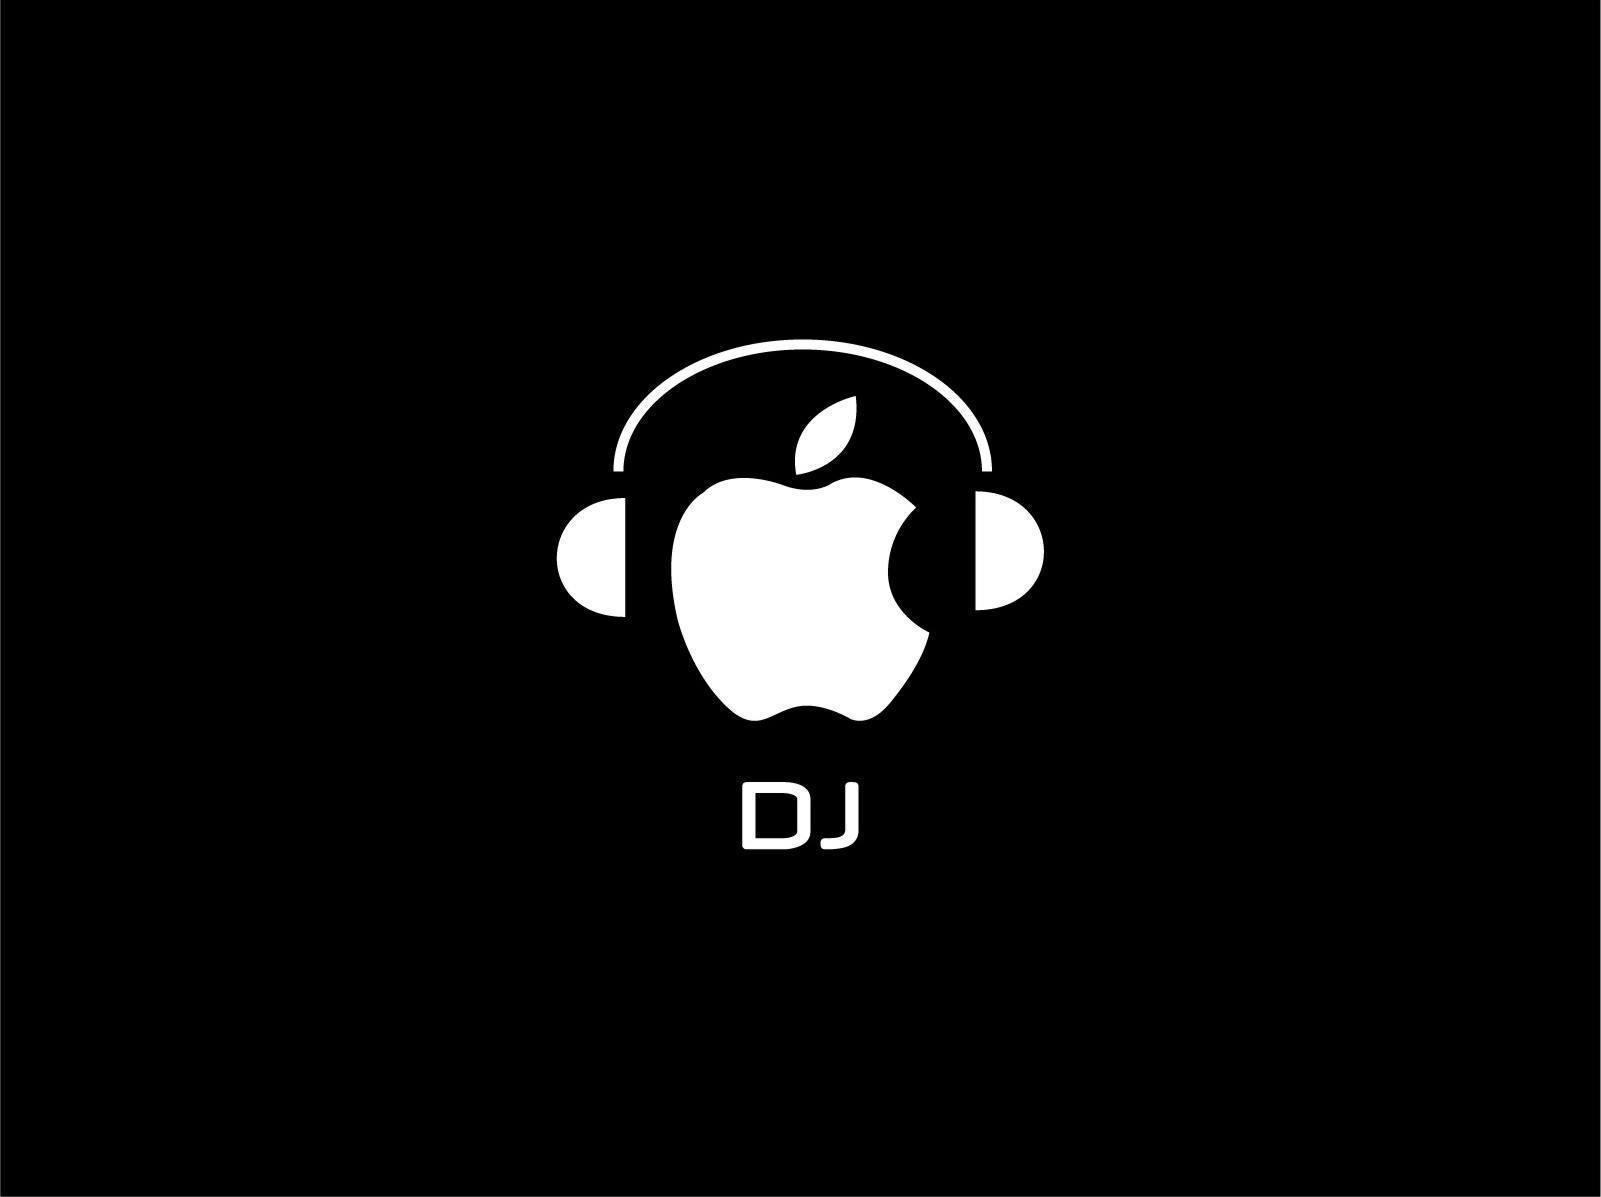 hd dj wallpapers for mac - wallpaper cave